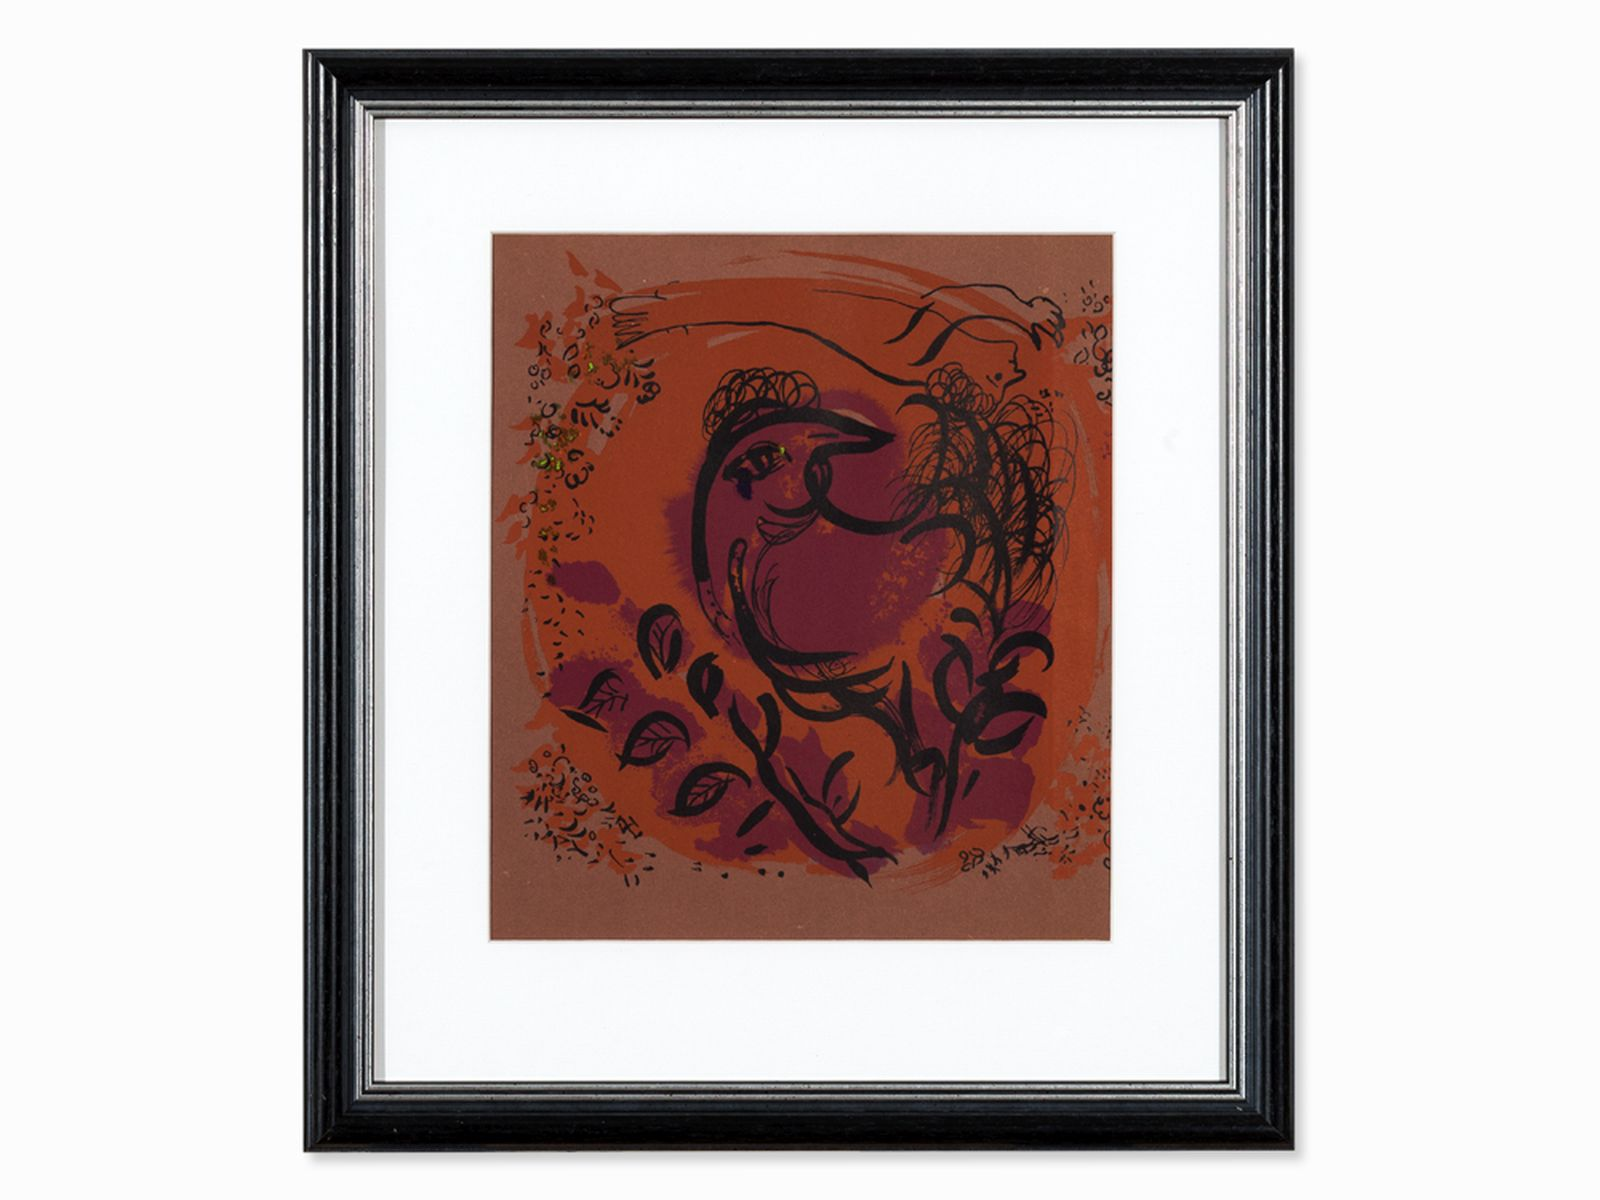 "#141 Marc Chagall, Lithograph, 'Coq', Paris 1960 | Marc Chagall (1897-1985) ""Coq"", Paris 1960 Image"